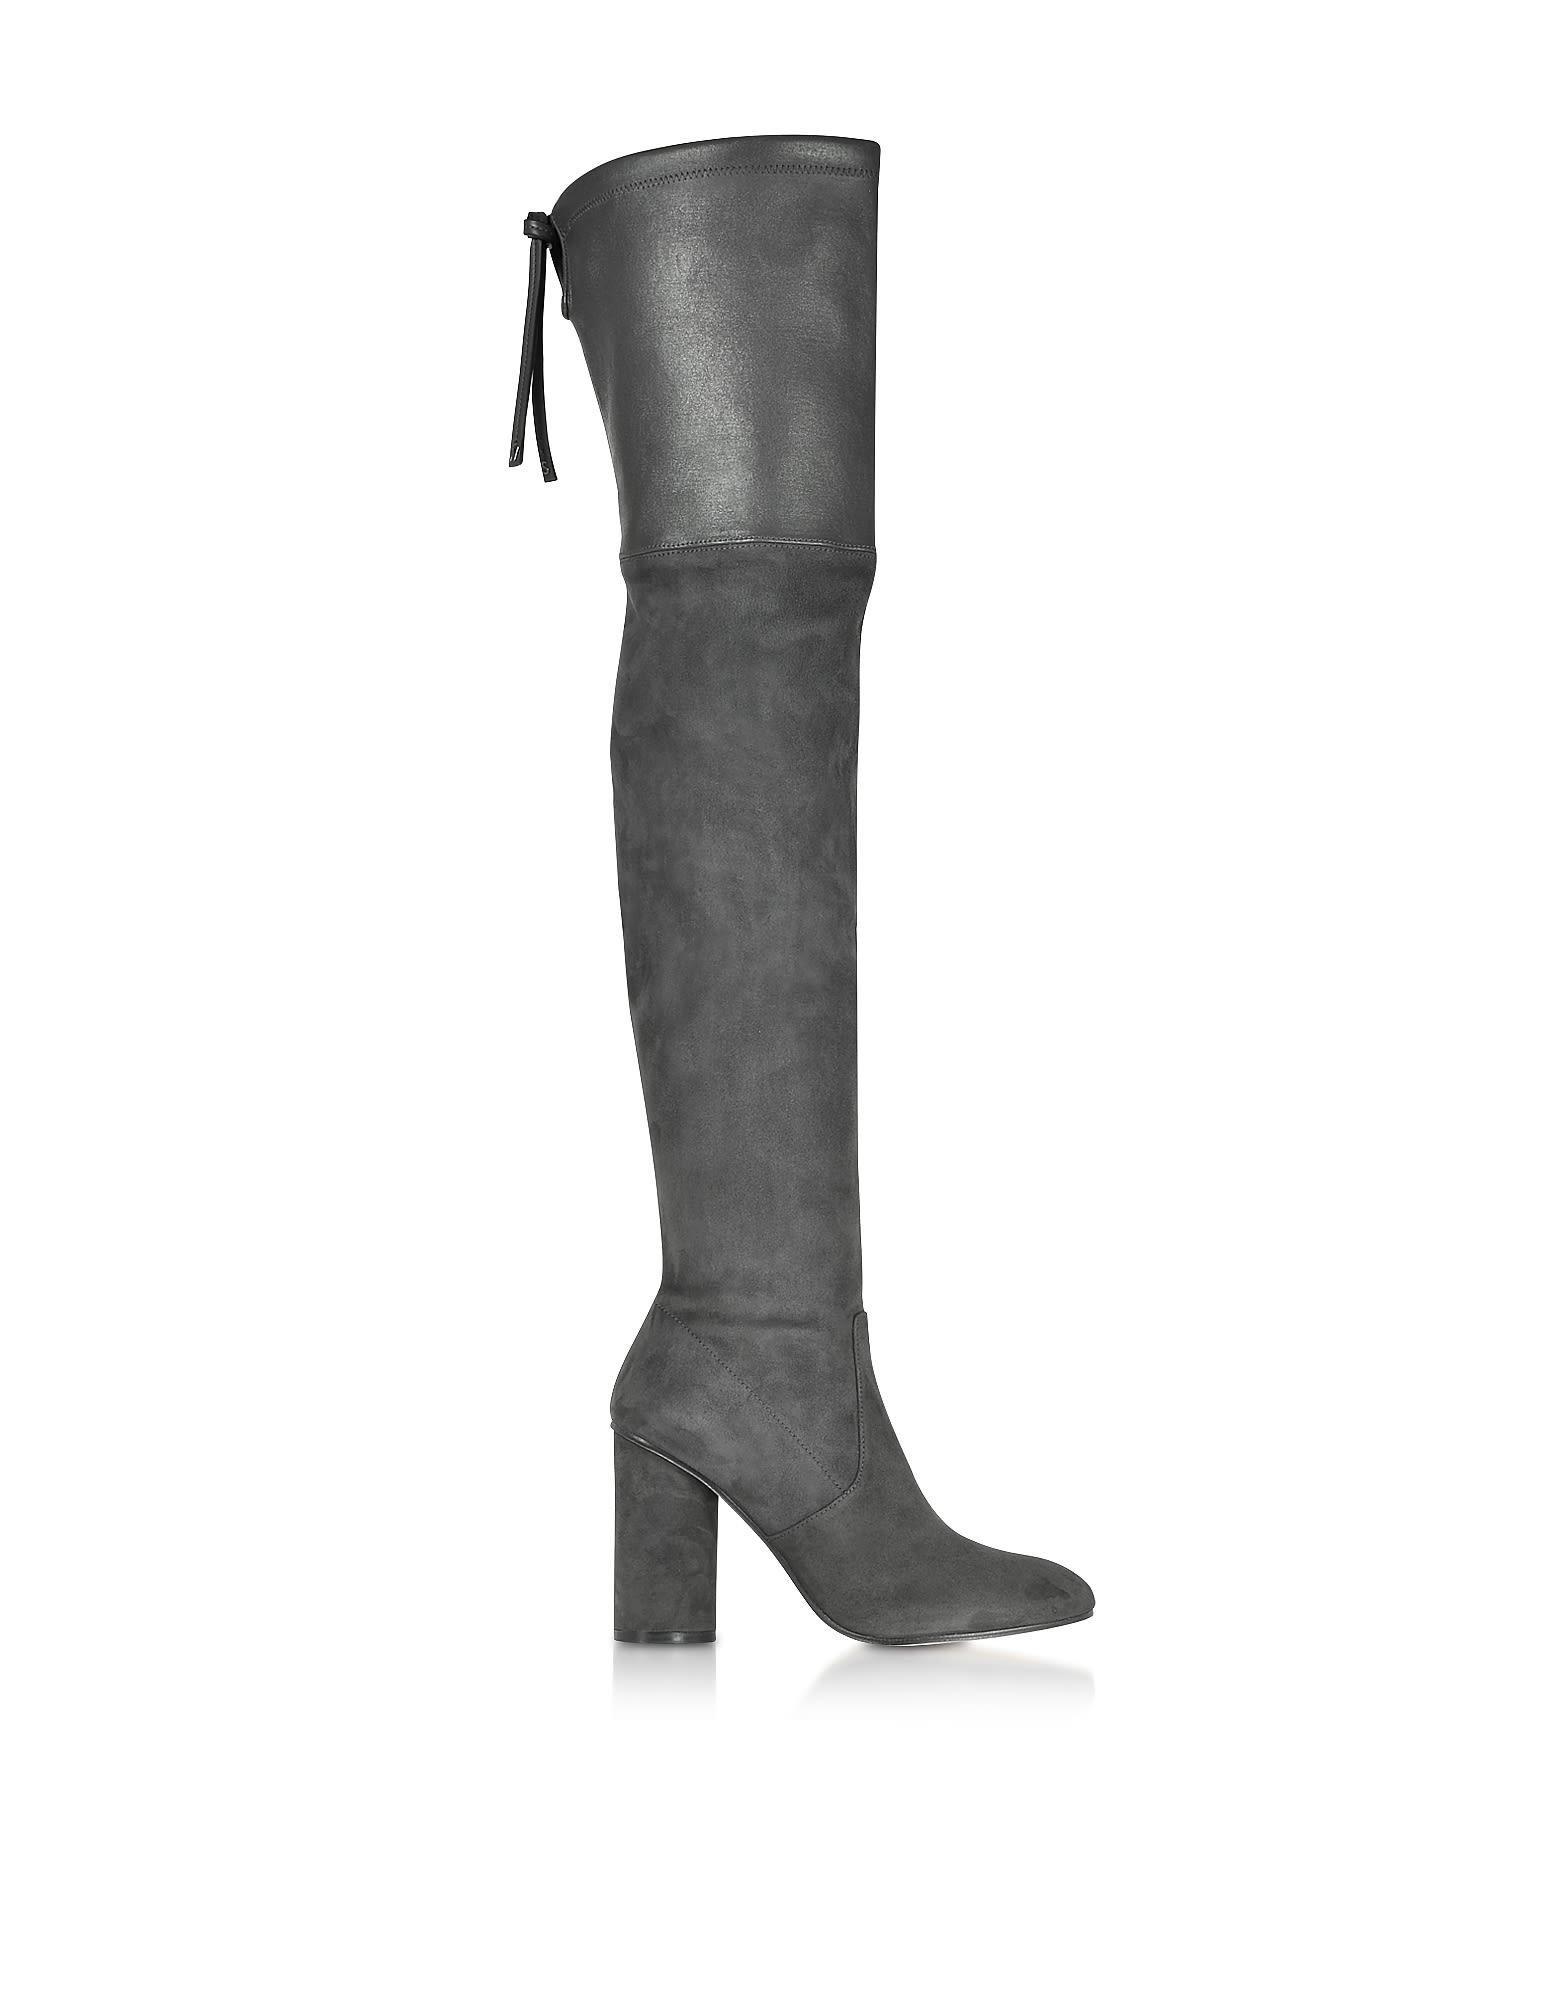 Stuart Weitzman Helena 95 Asphalt Fushion Suede Boots